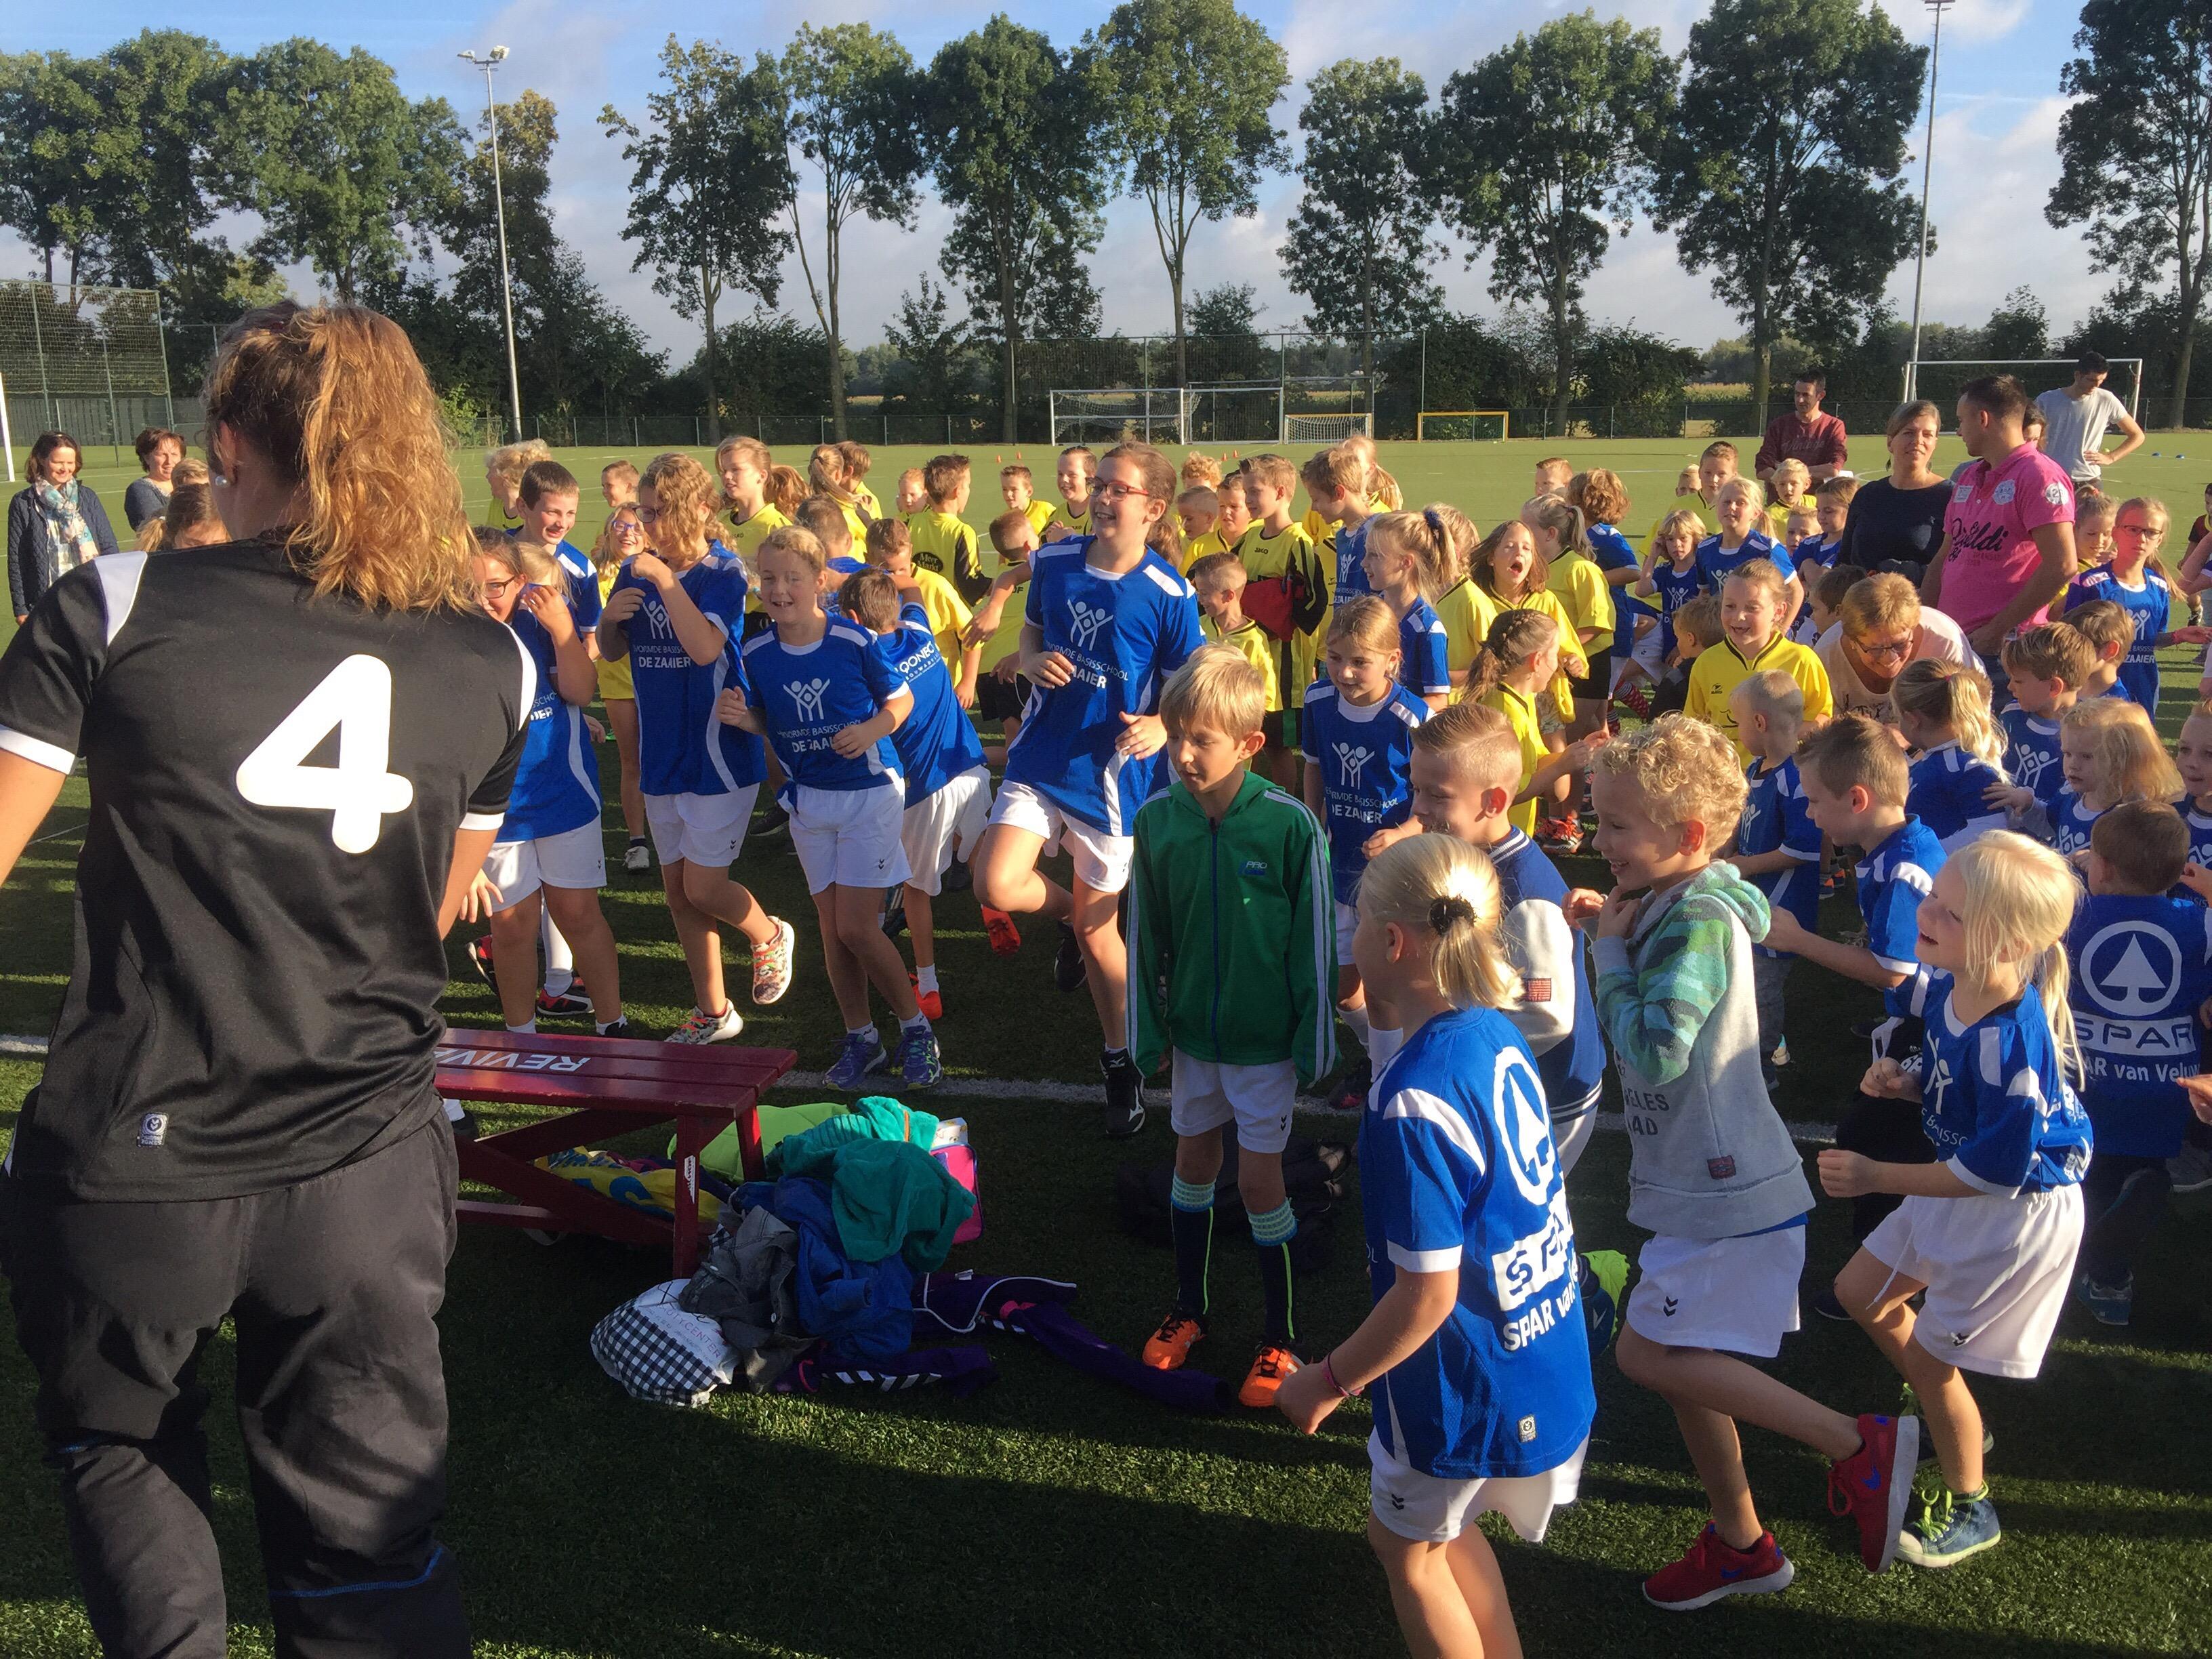 Rabobank schoolkorfbal toernooi is gestart!